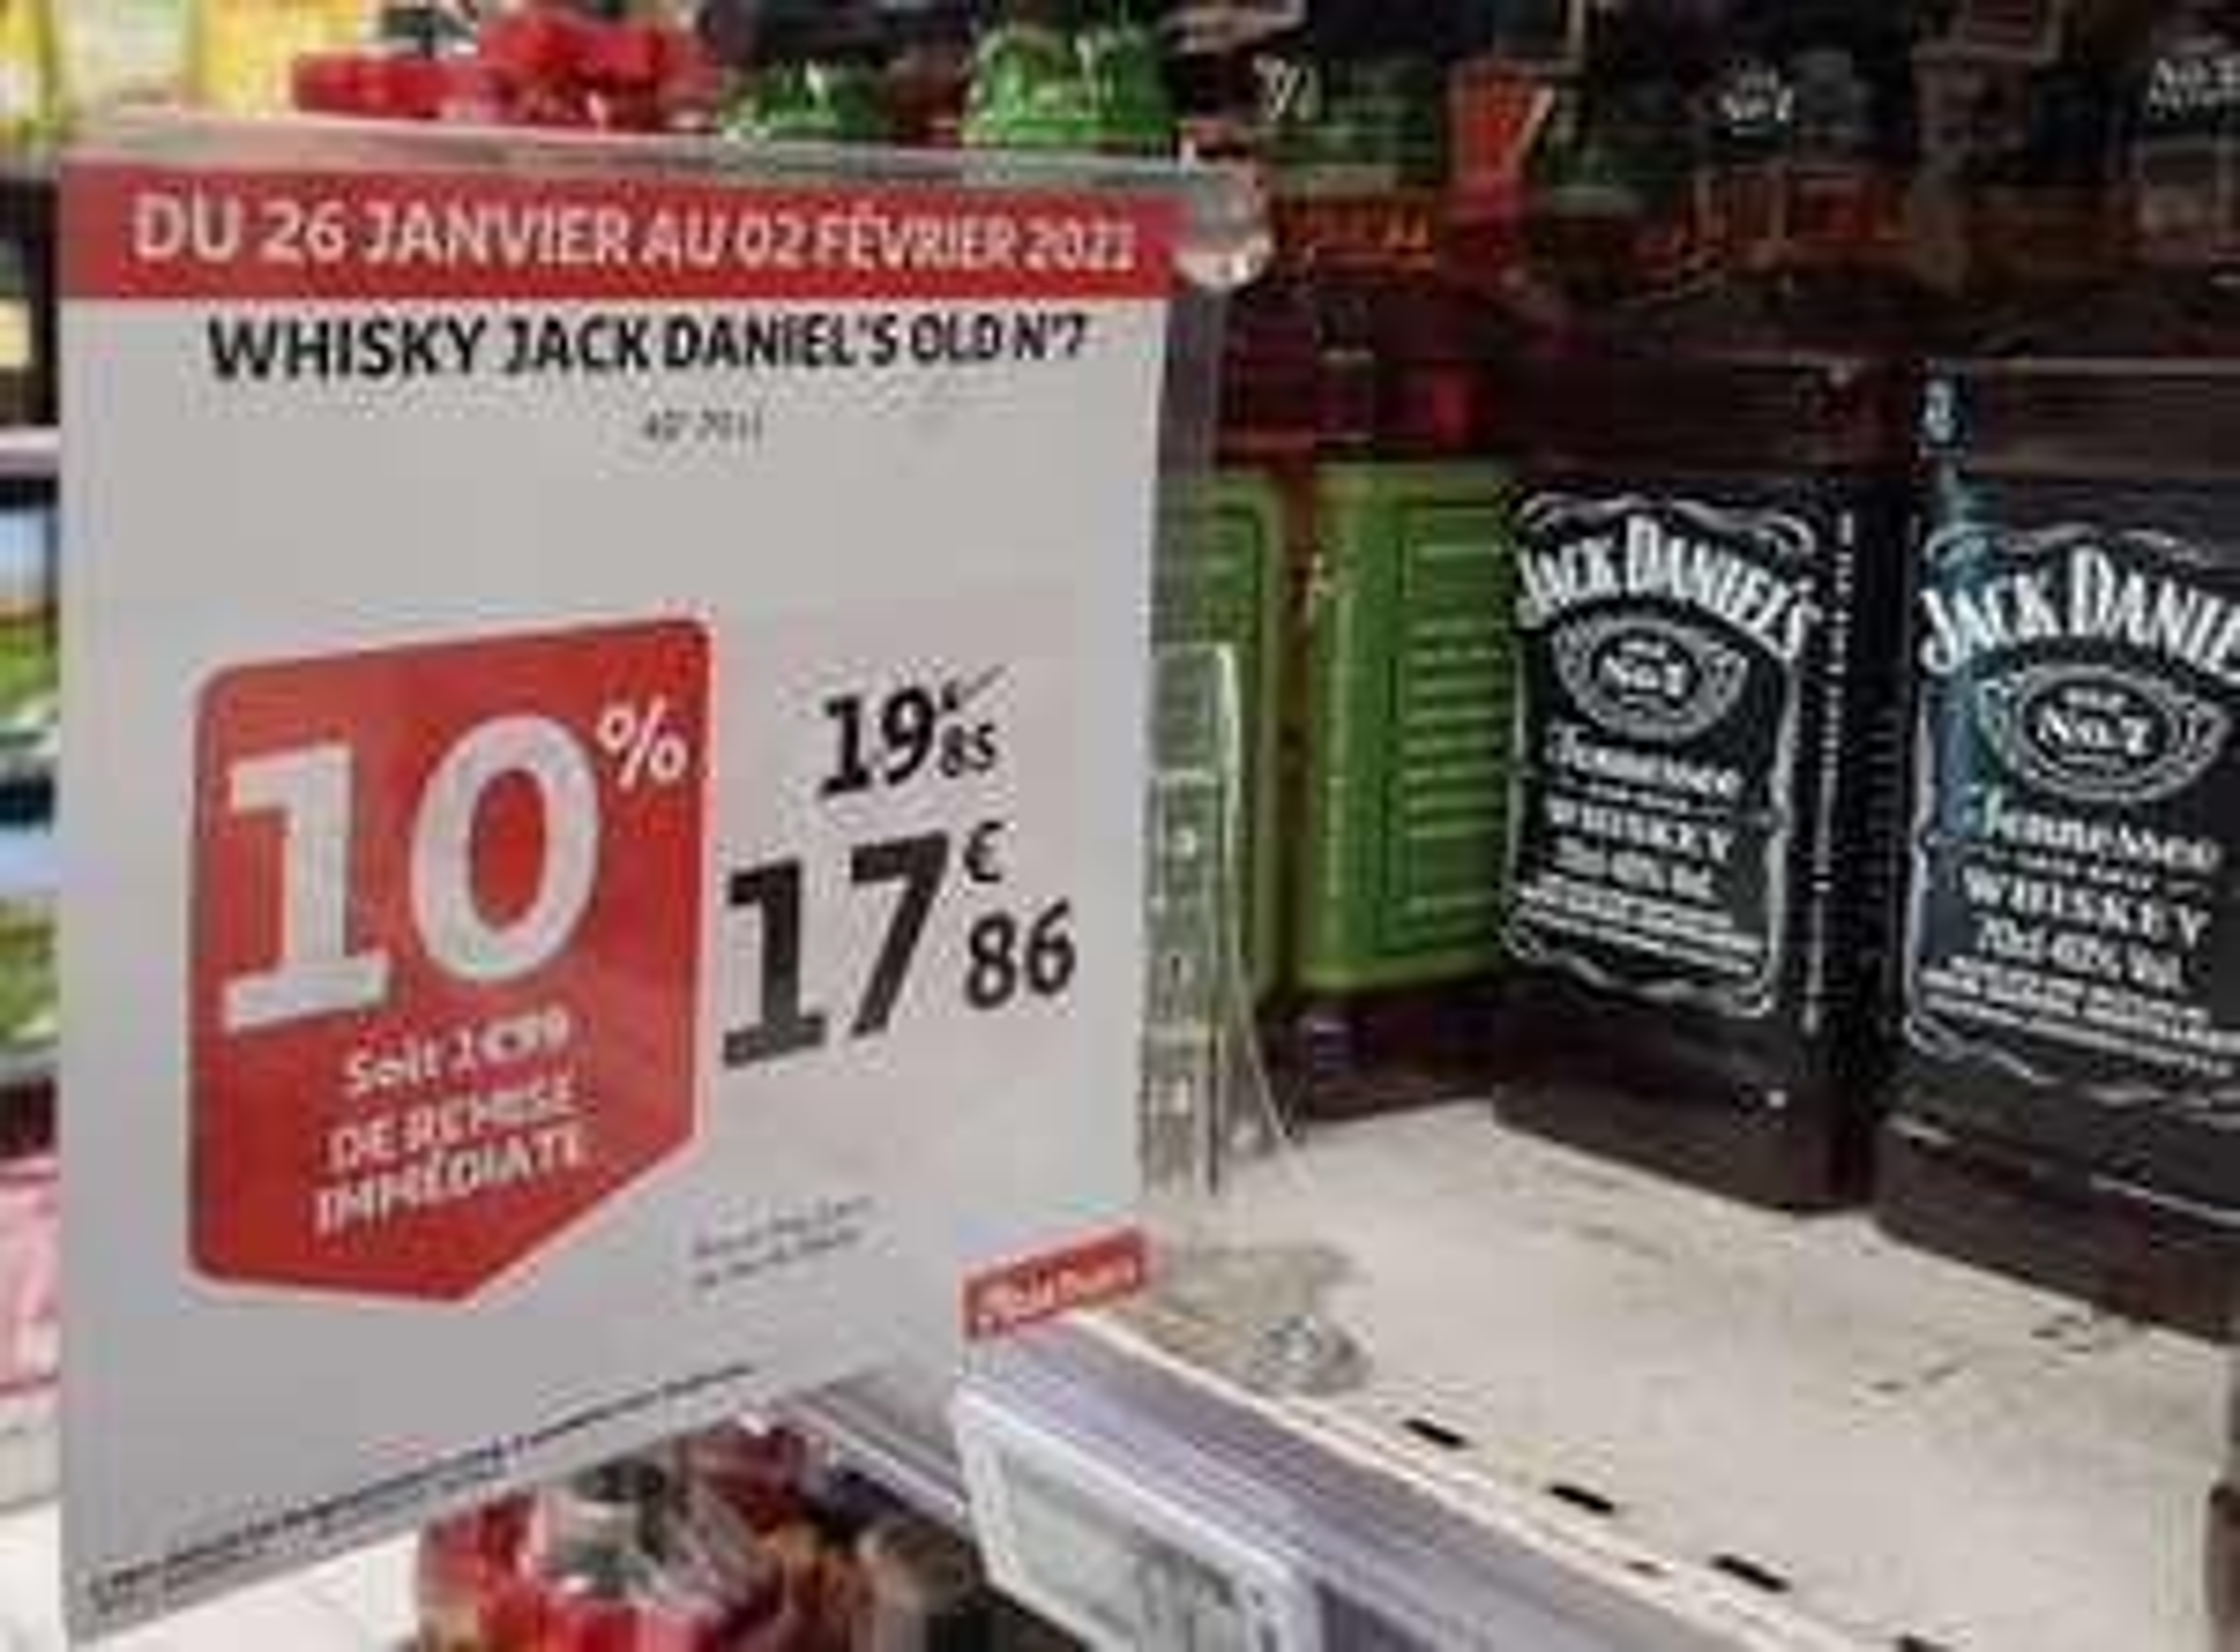 Bouteille de whisky Jack Daniel's Tennessee Old n°7 (70 cl) - Puteaux (92)